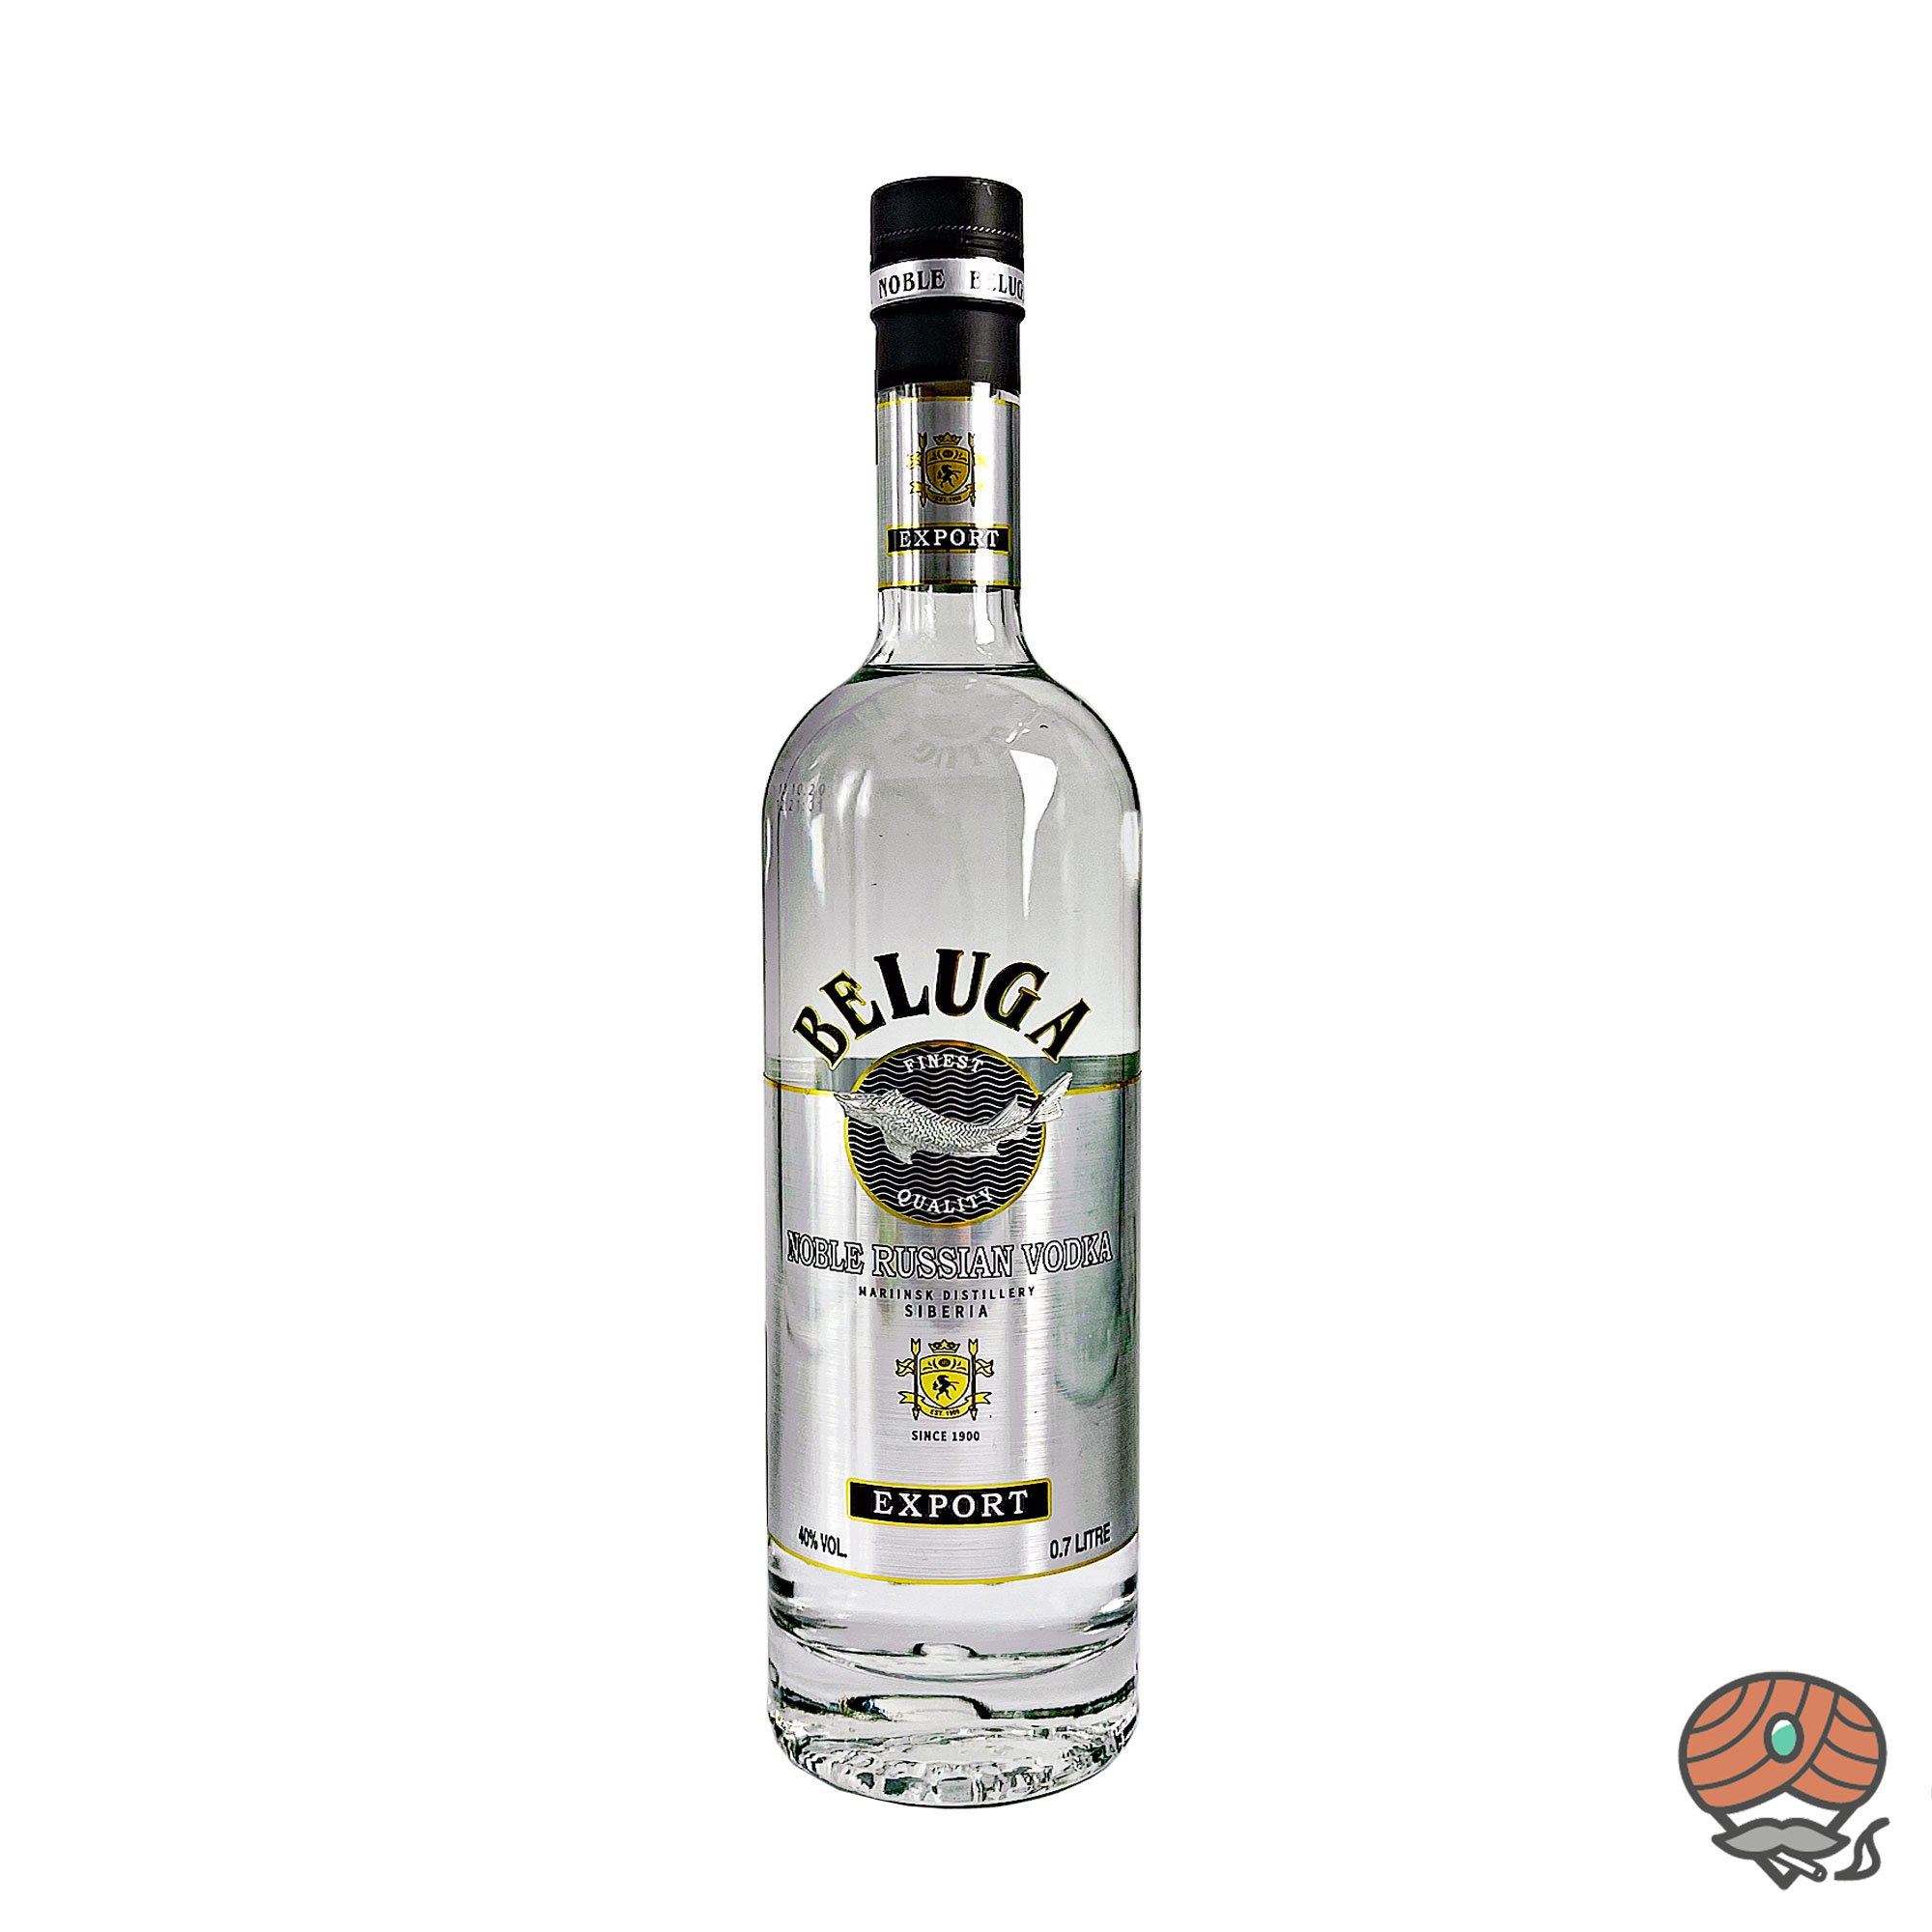 Beluga Noble Russion Vodka - Wodka Siberia 0,7 l, alc. 40 Vol.-%